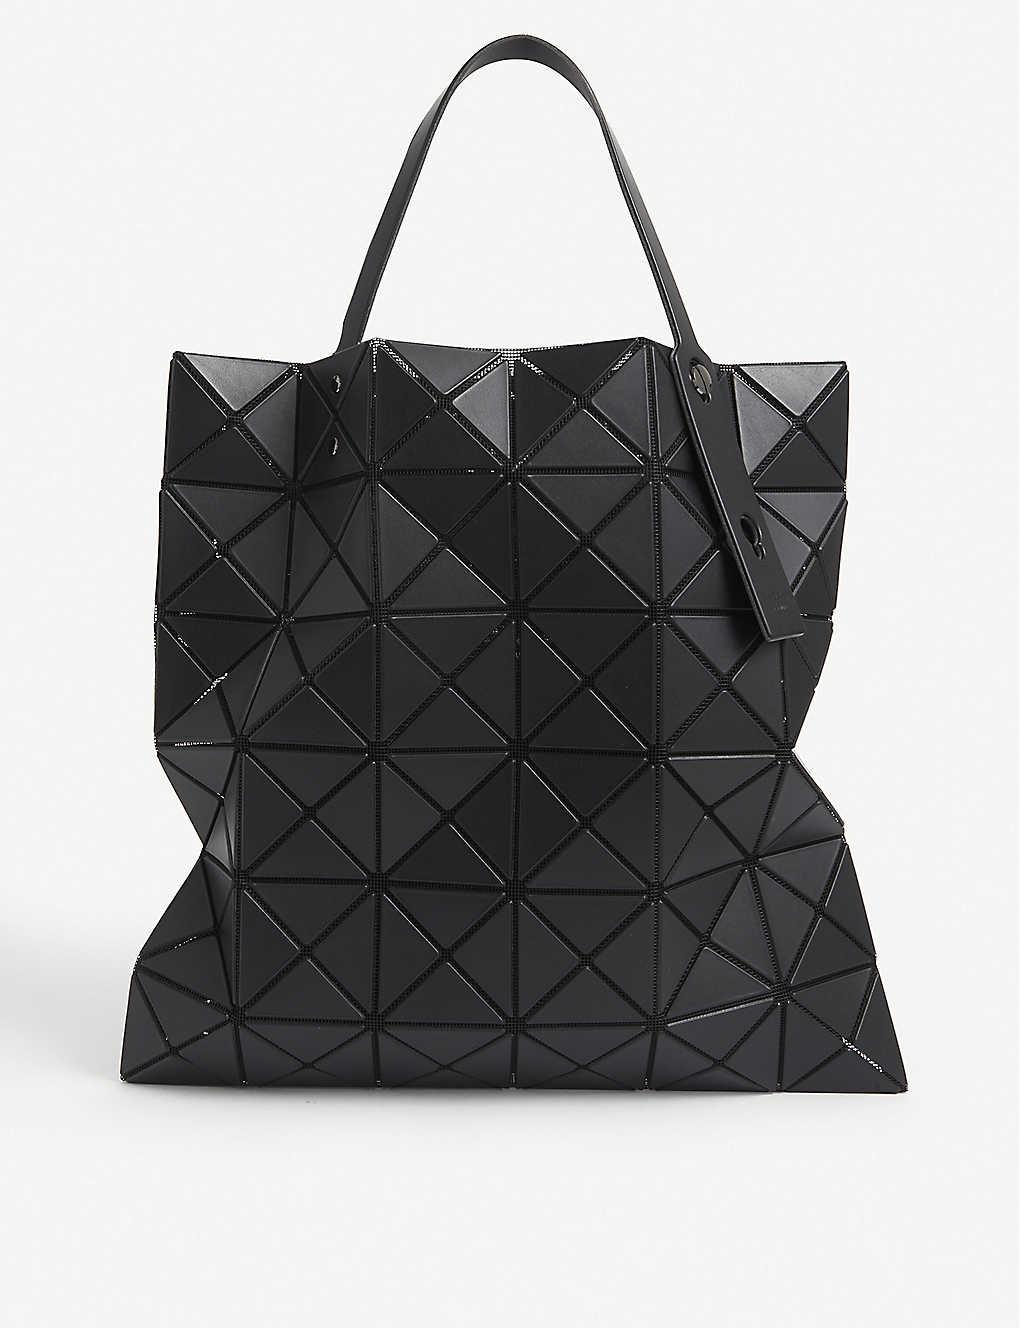 Bao Bao Issey Miyake Lucent Matte Geometric Tote In Black